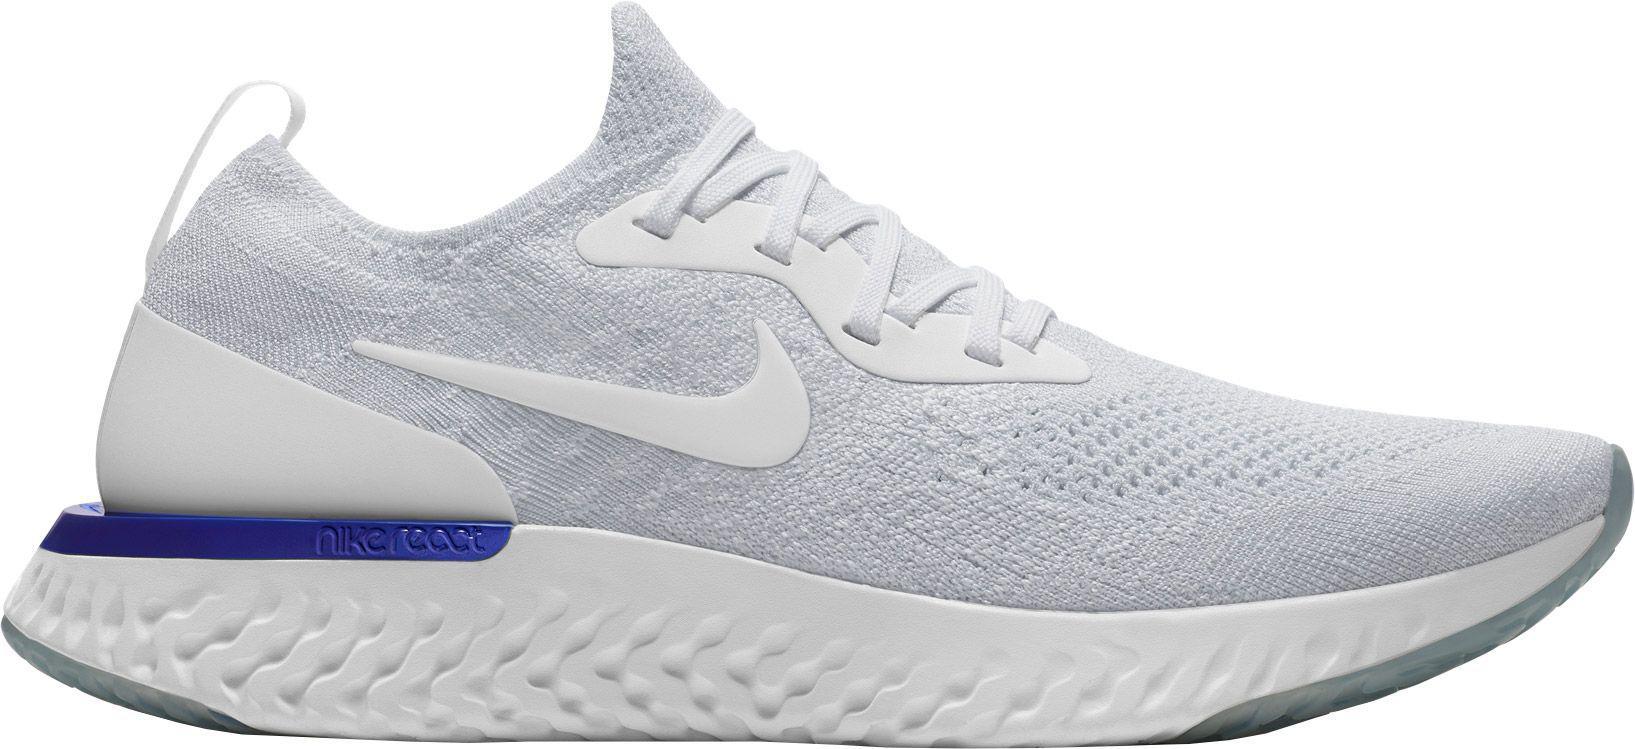 8f827e4990e7 Lyst - Nike Epic React Flyknit Running Shoes in White for Men